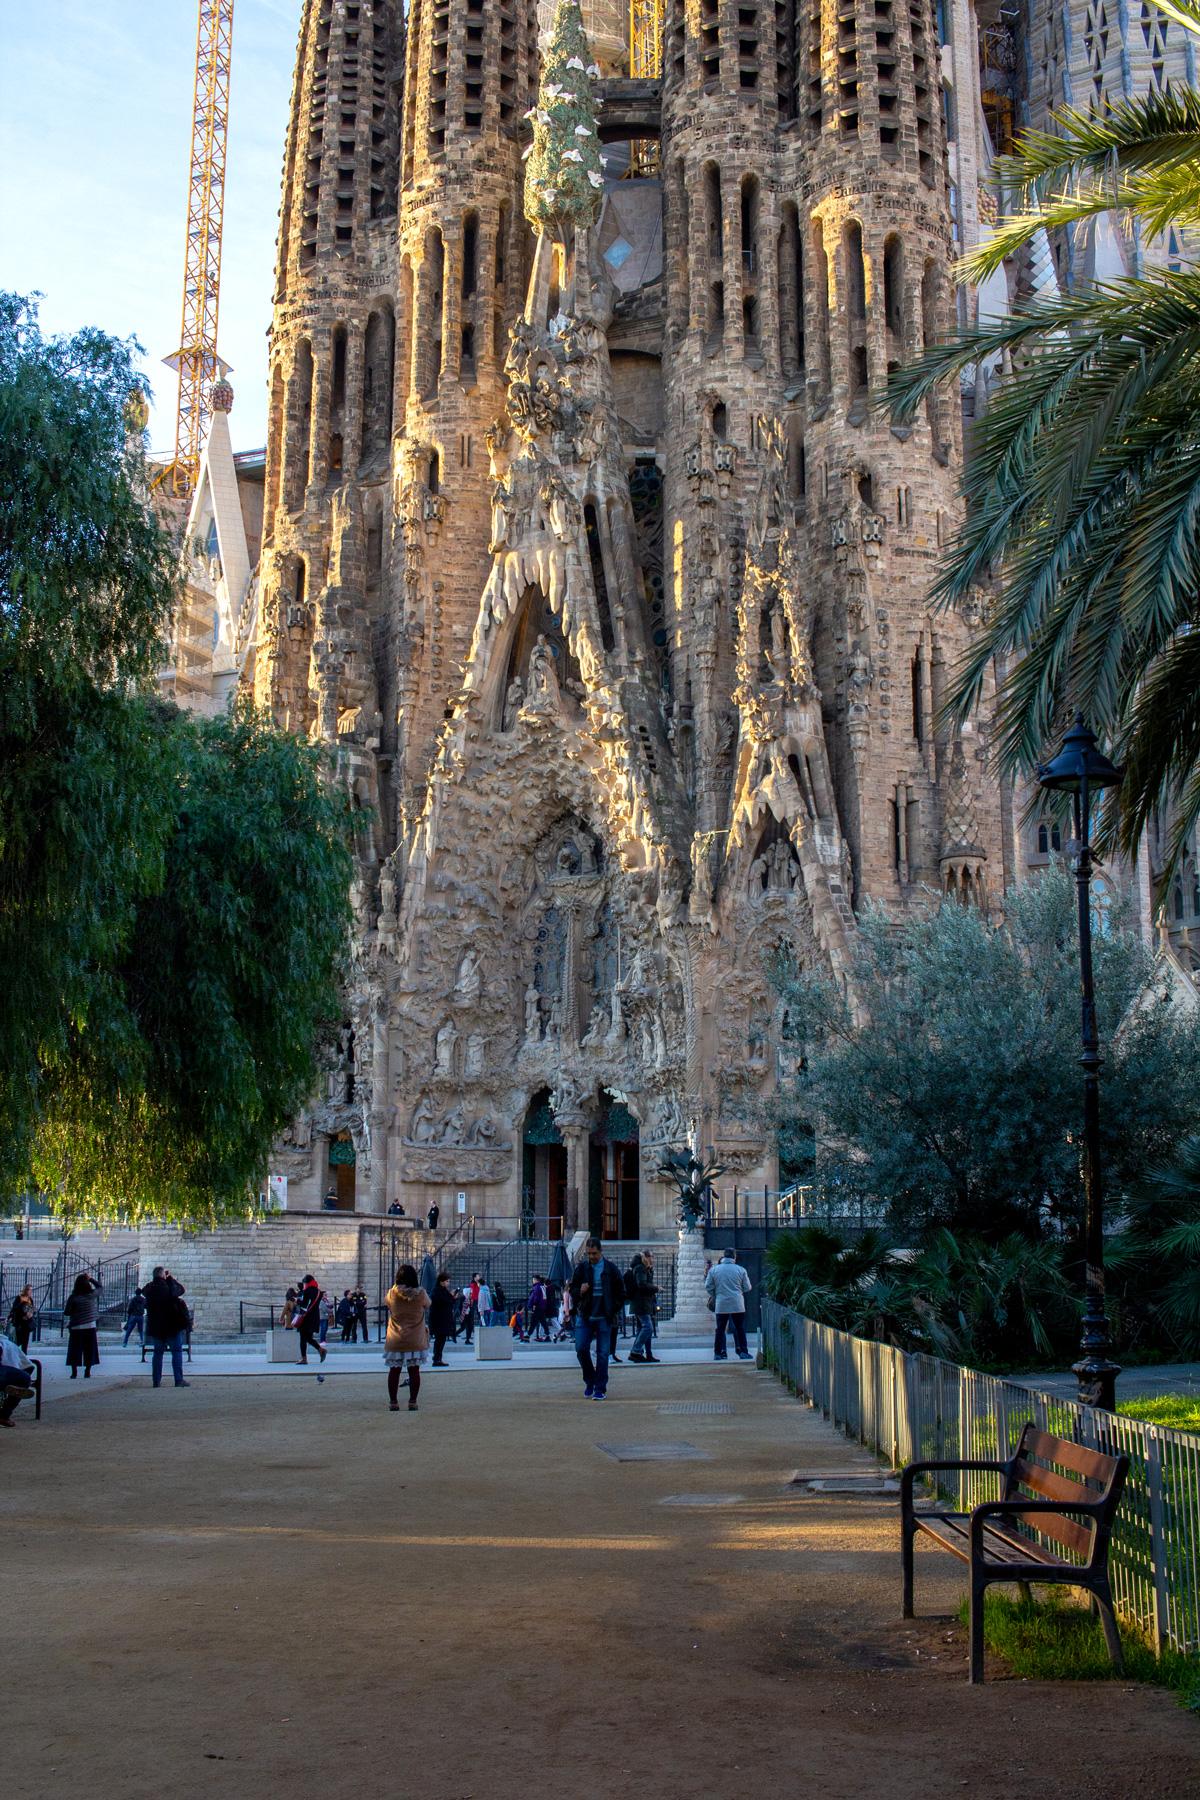 The Sagrada Familia from the park.